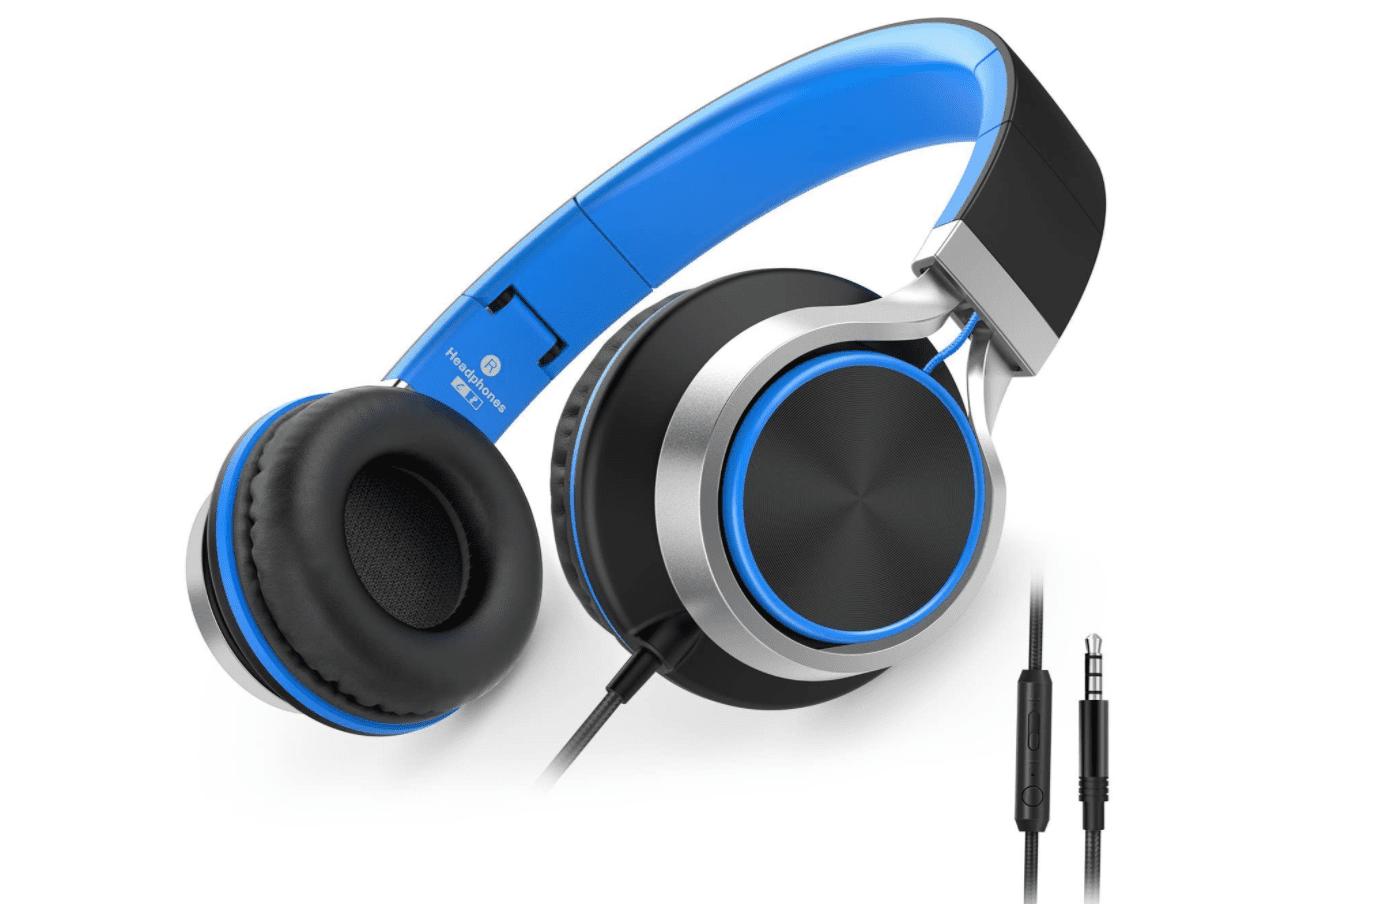 AILIHEN C8 Wired Headphones